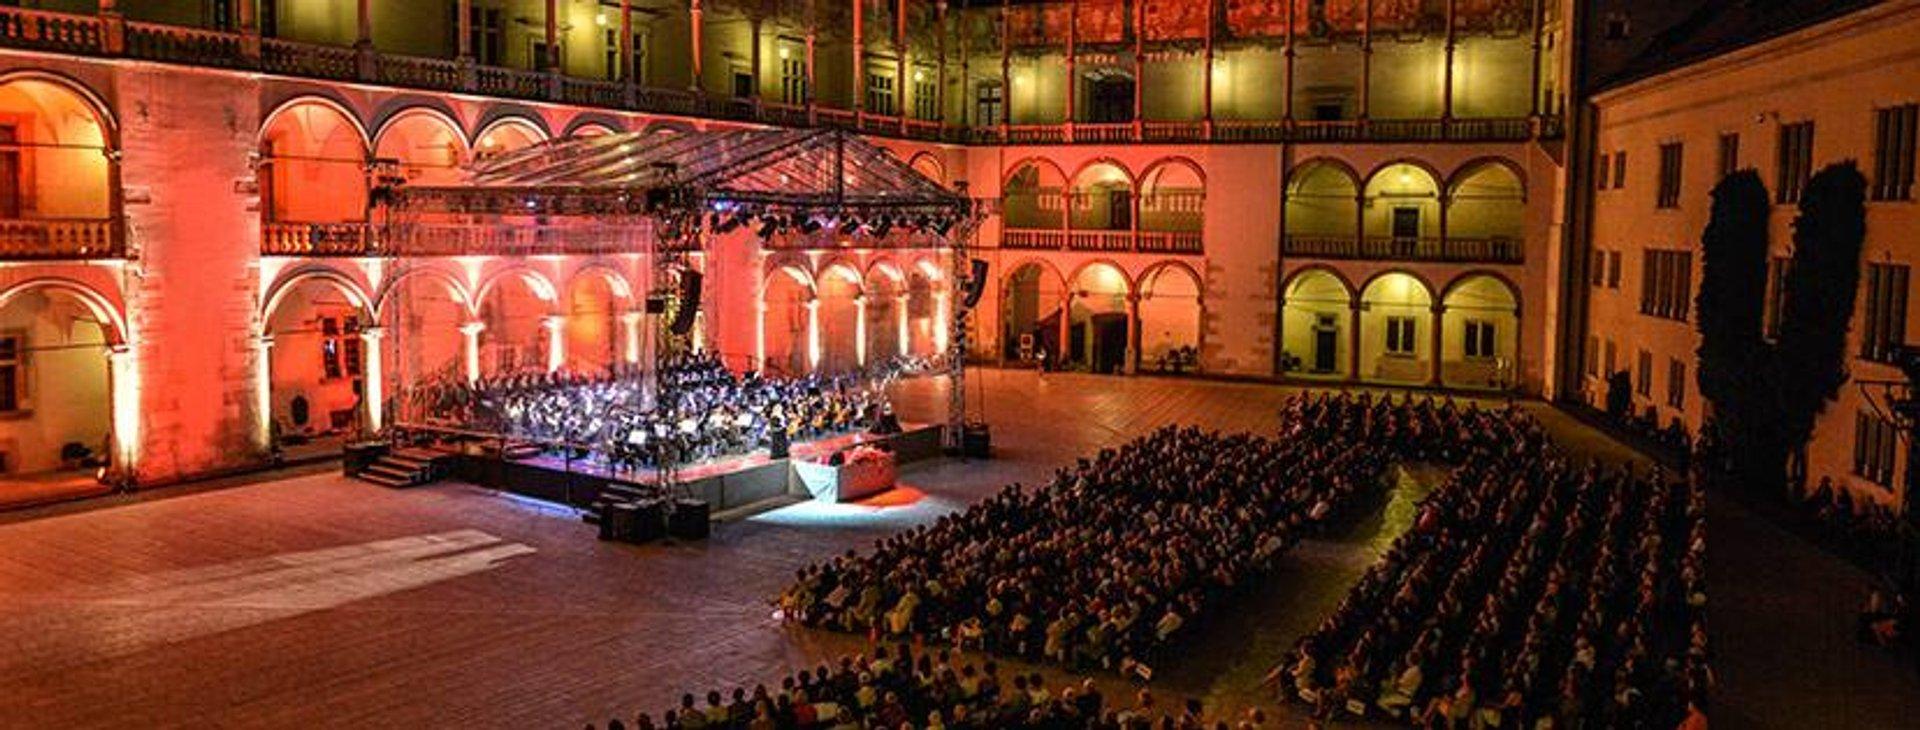 Summer Opera Festival in Krakow - Best Season 2020